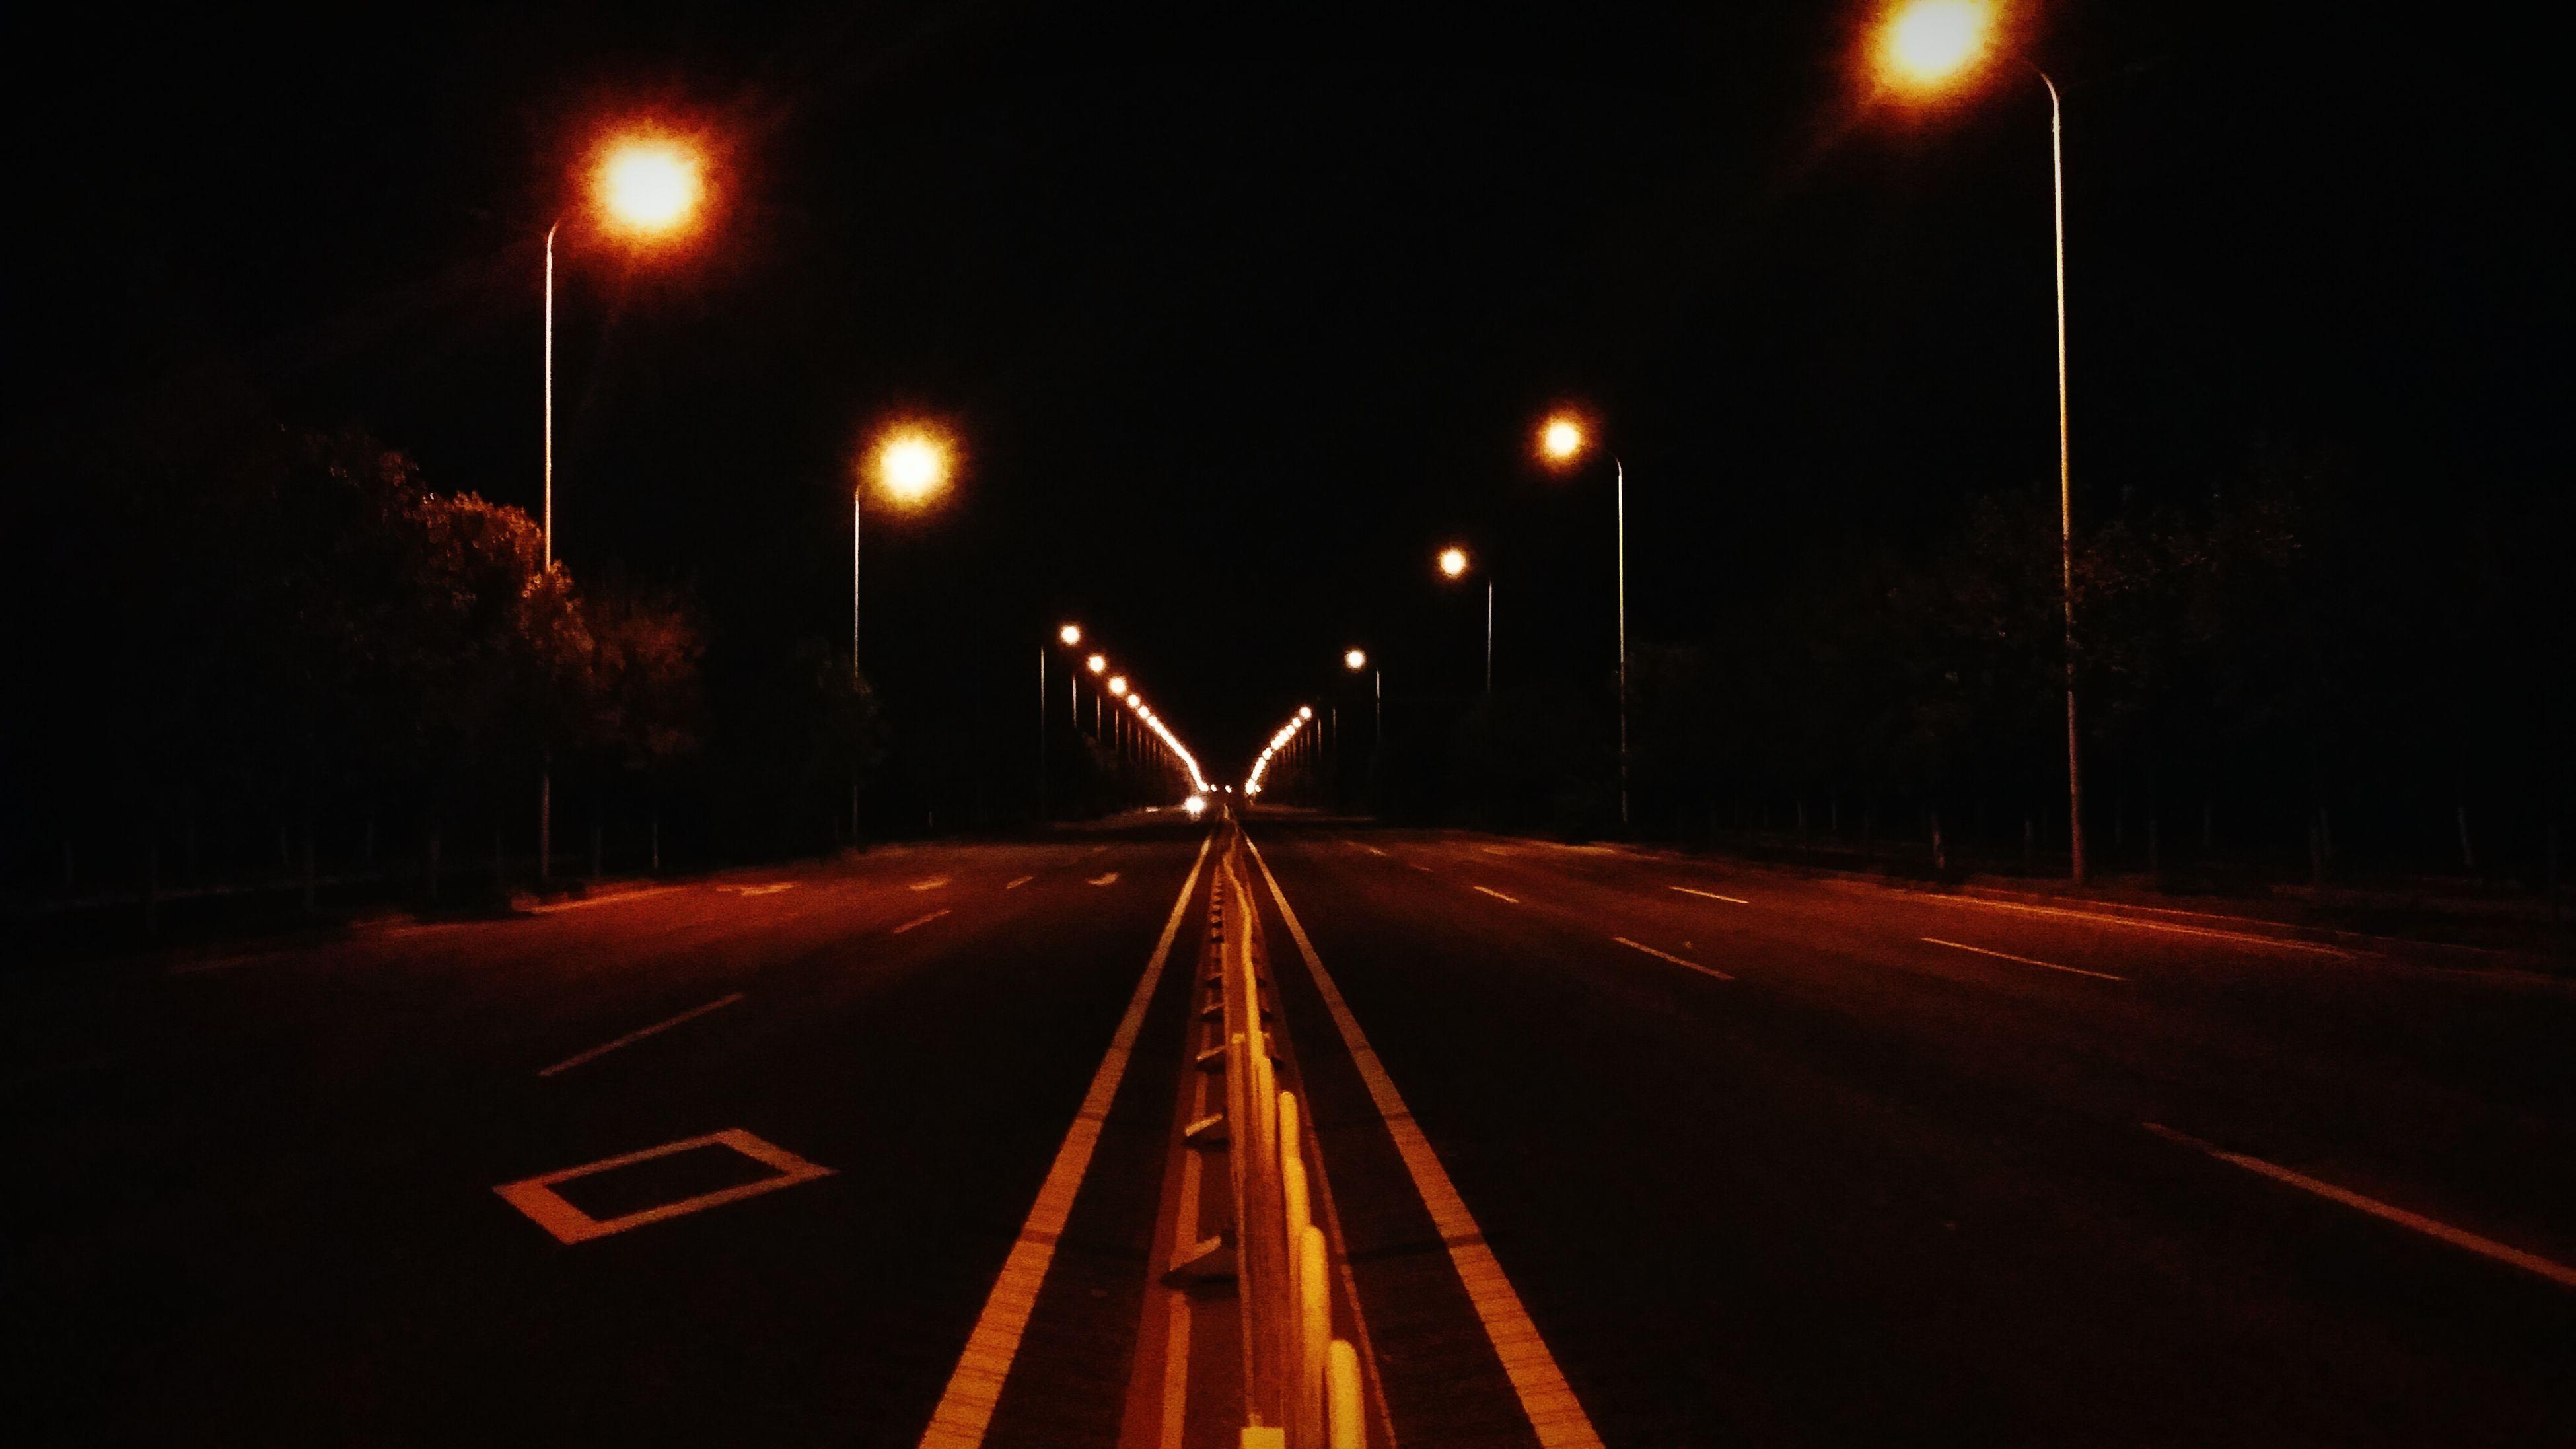 illuminated, transportation, the way forward, night, road, street light, diminishing perspective, road marking, vanishing point, lighting equipment, speed, long exposure, light trail, motion, street, red, sky, outdoors, road sign, tree